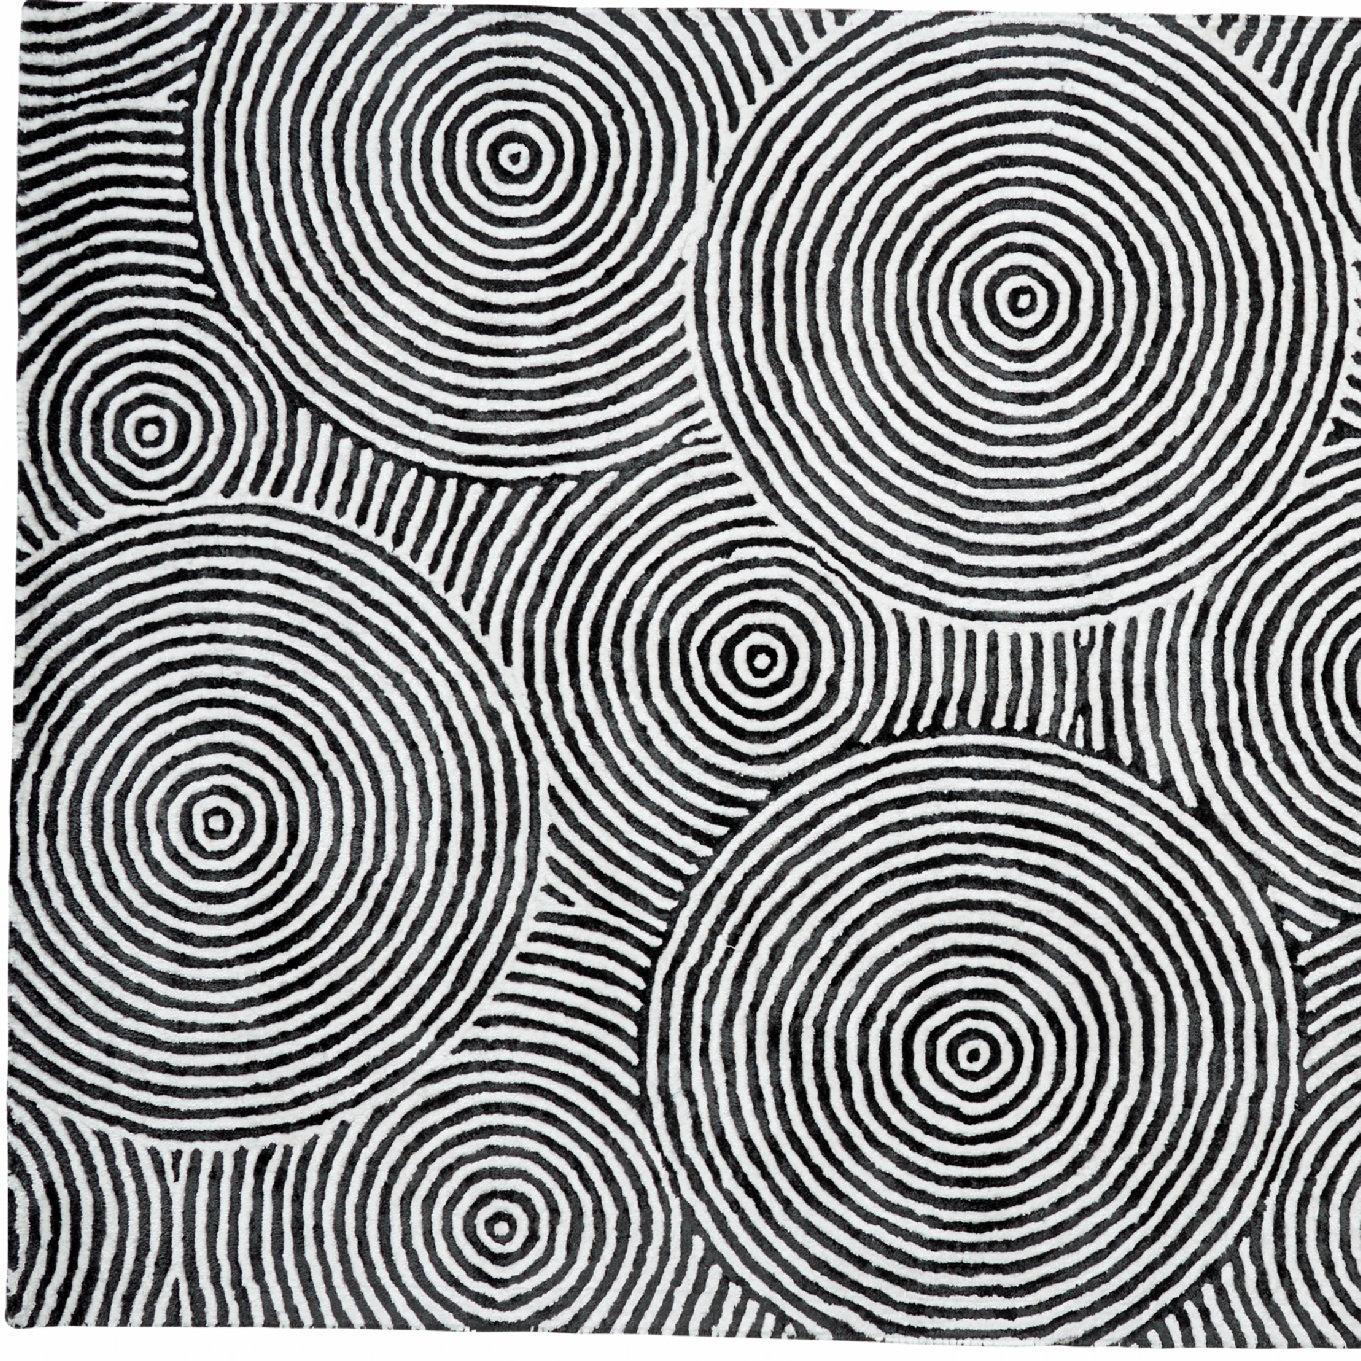 Black And White Geometric Kitchen Rug: Dynamic Rugs Celeste Black / White Geometric Rug & Reviews